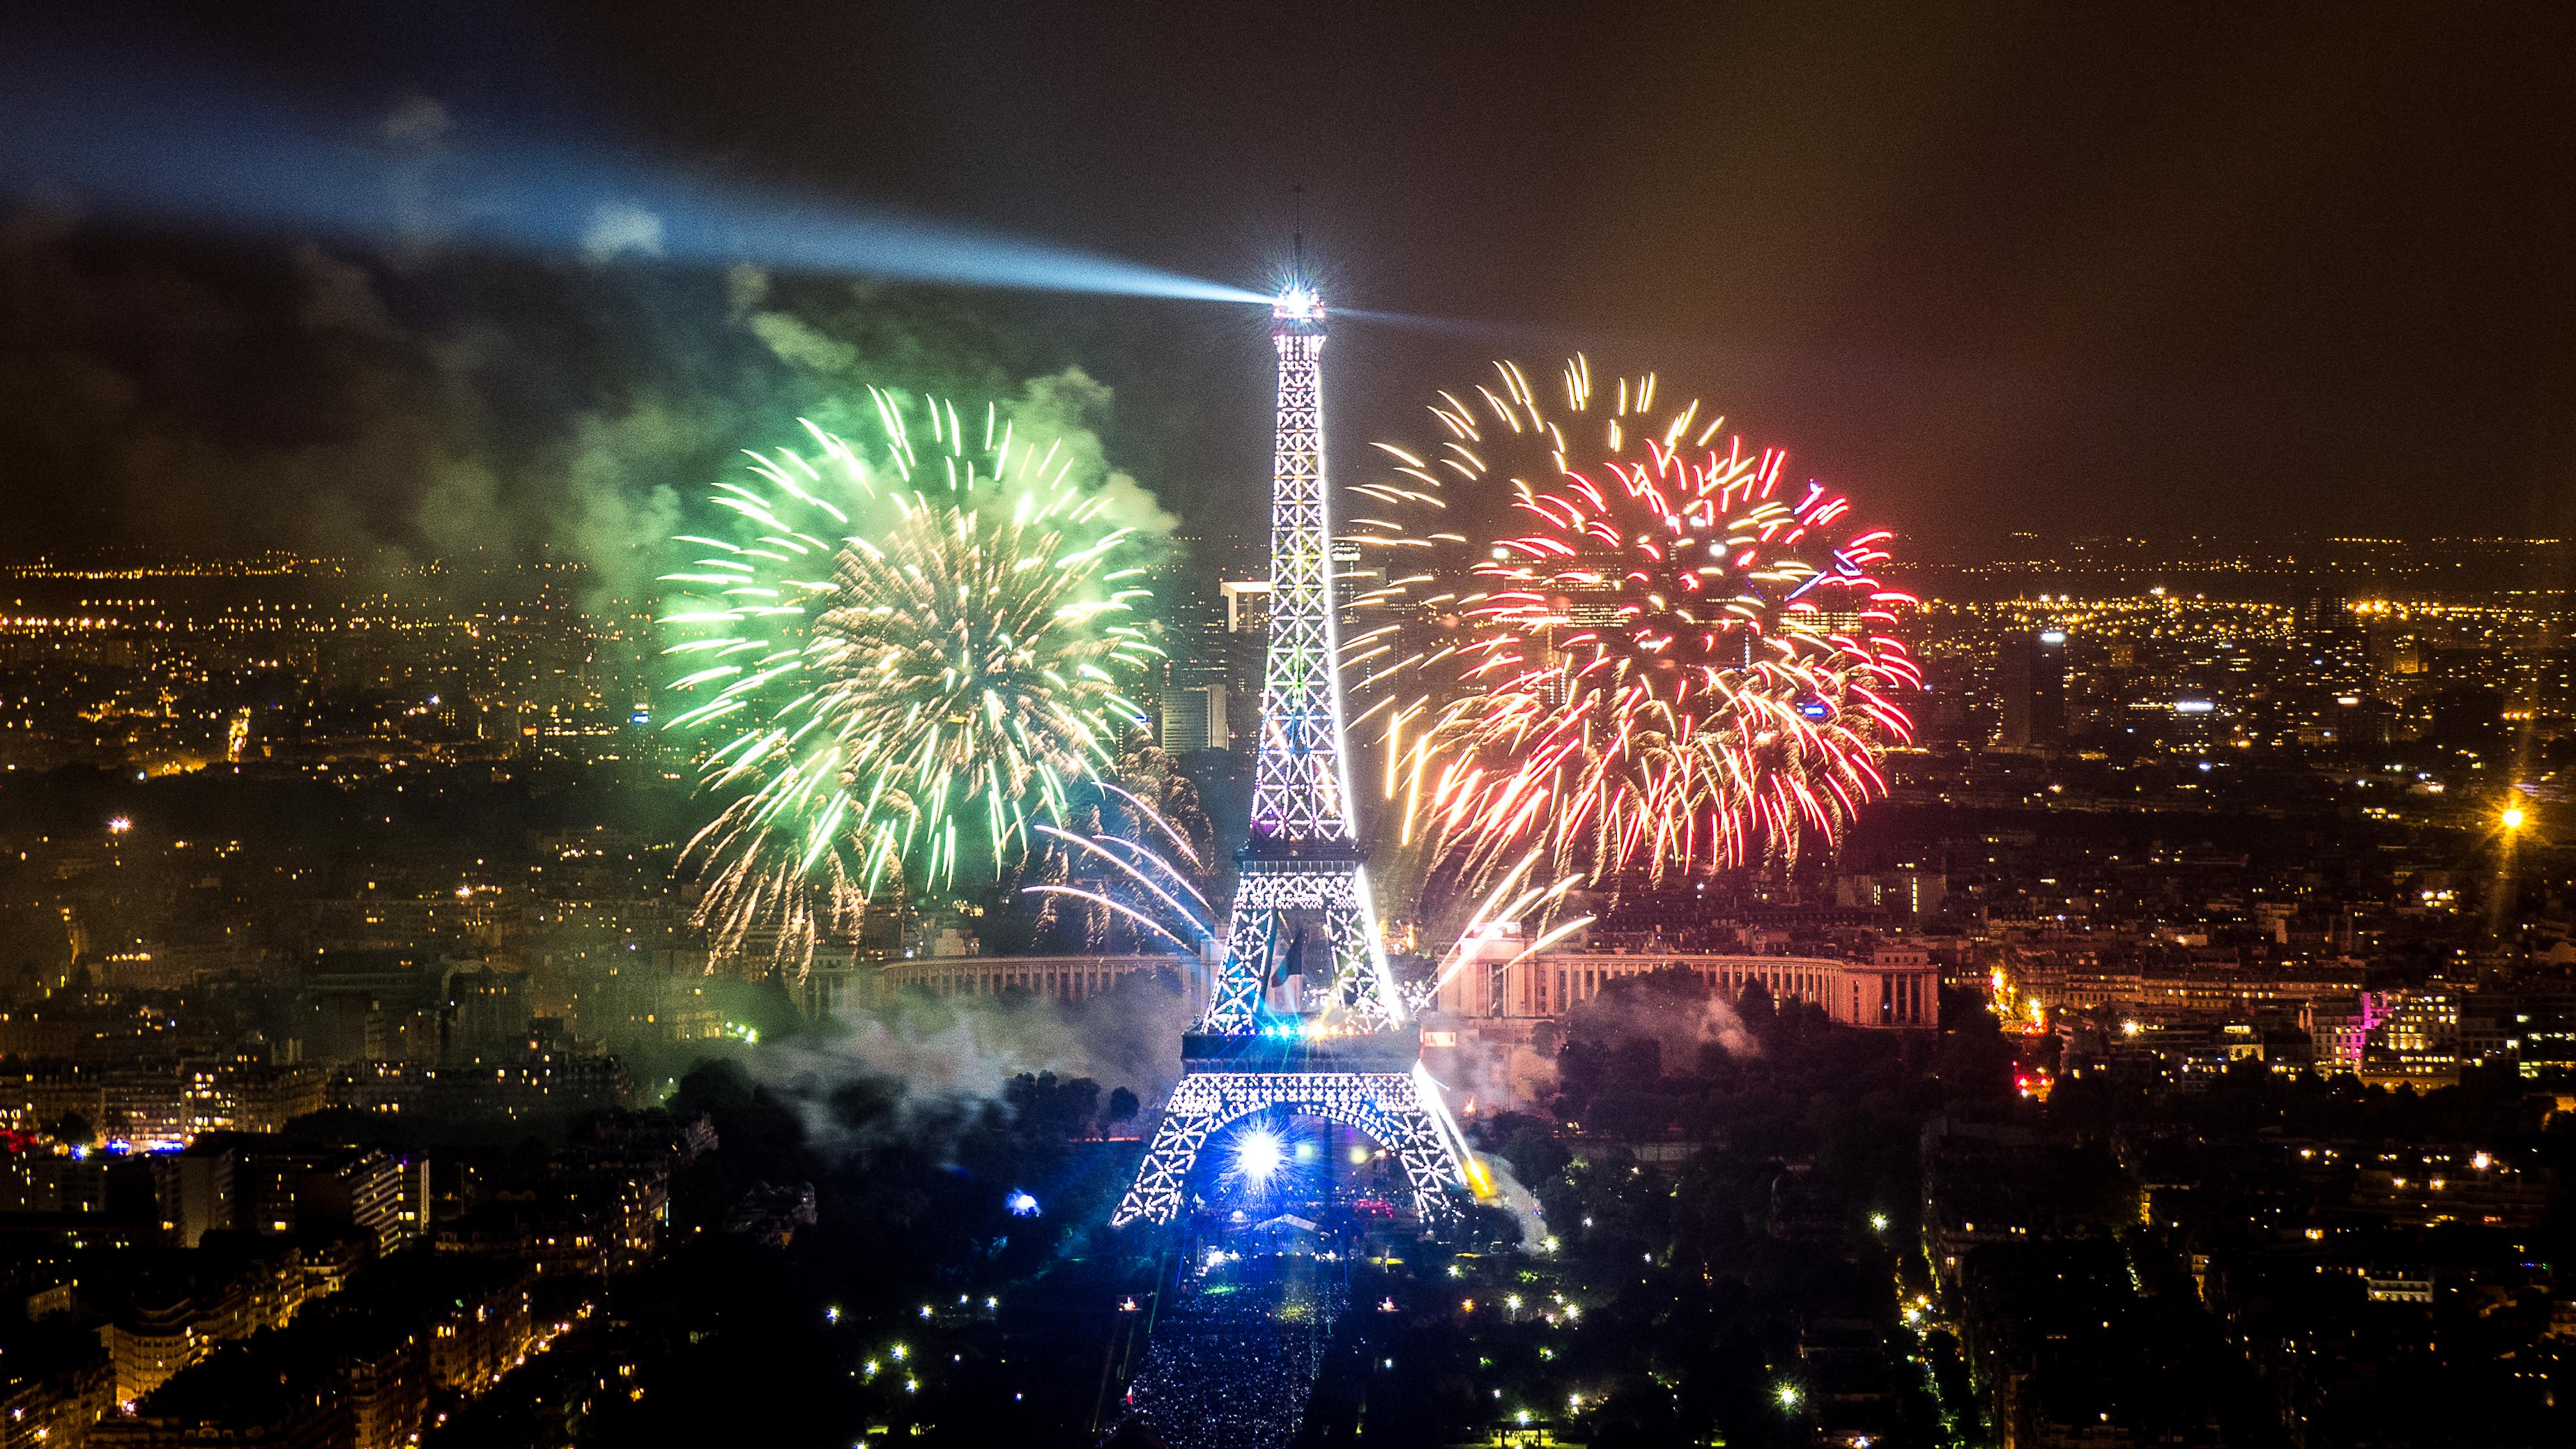 file:2013 fireworks on eiffel tower 12 - wikimedia commons